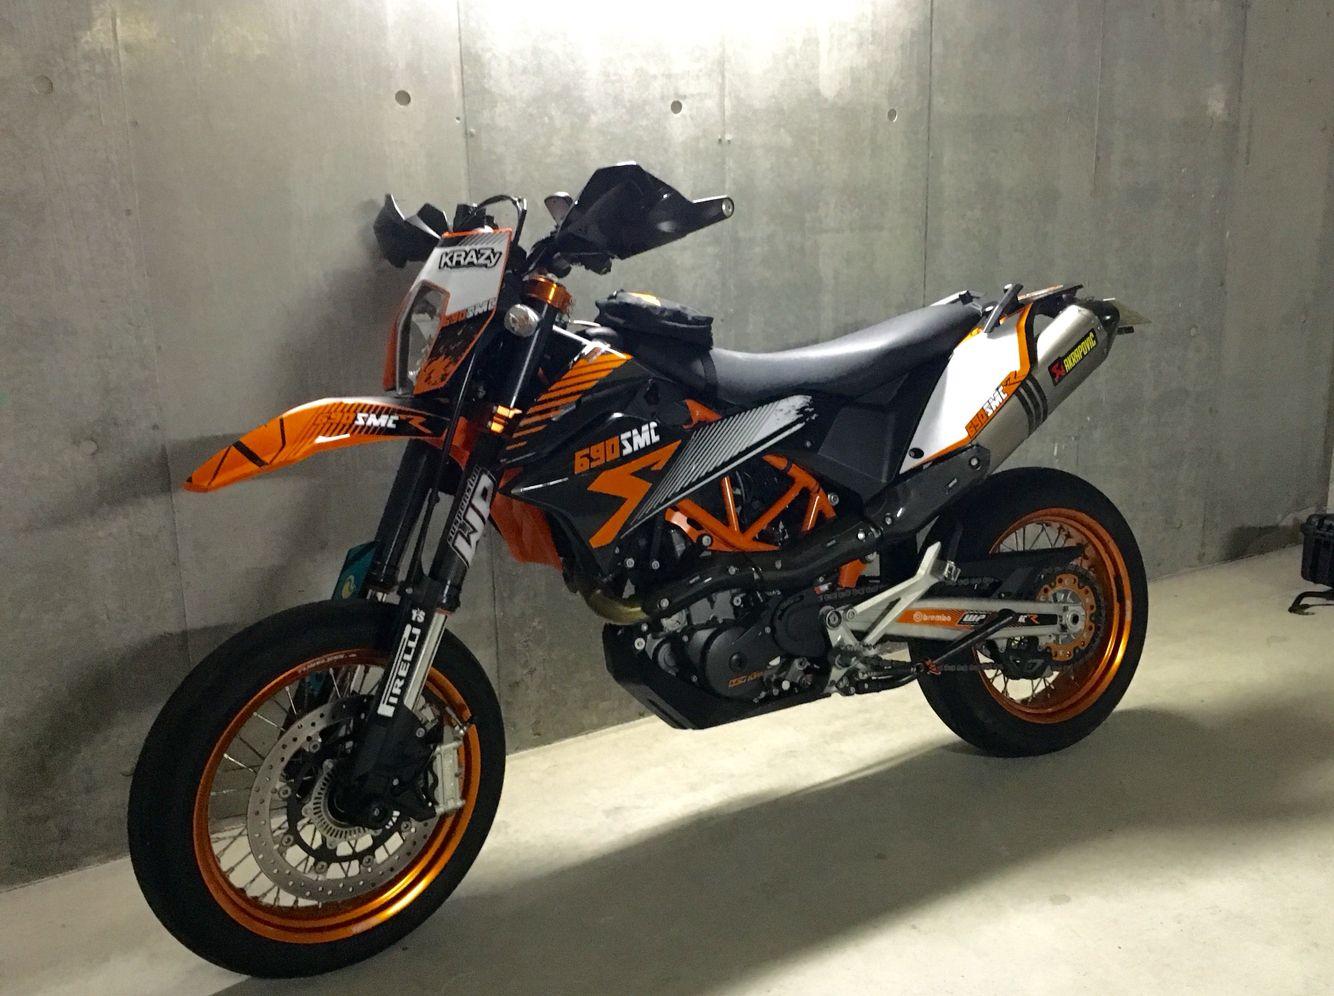 ktm690smc r motorbikes ktm 690 dirt biking and motorbikes